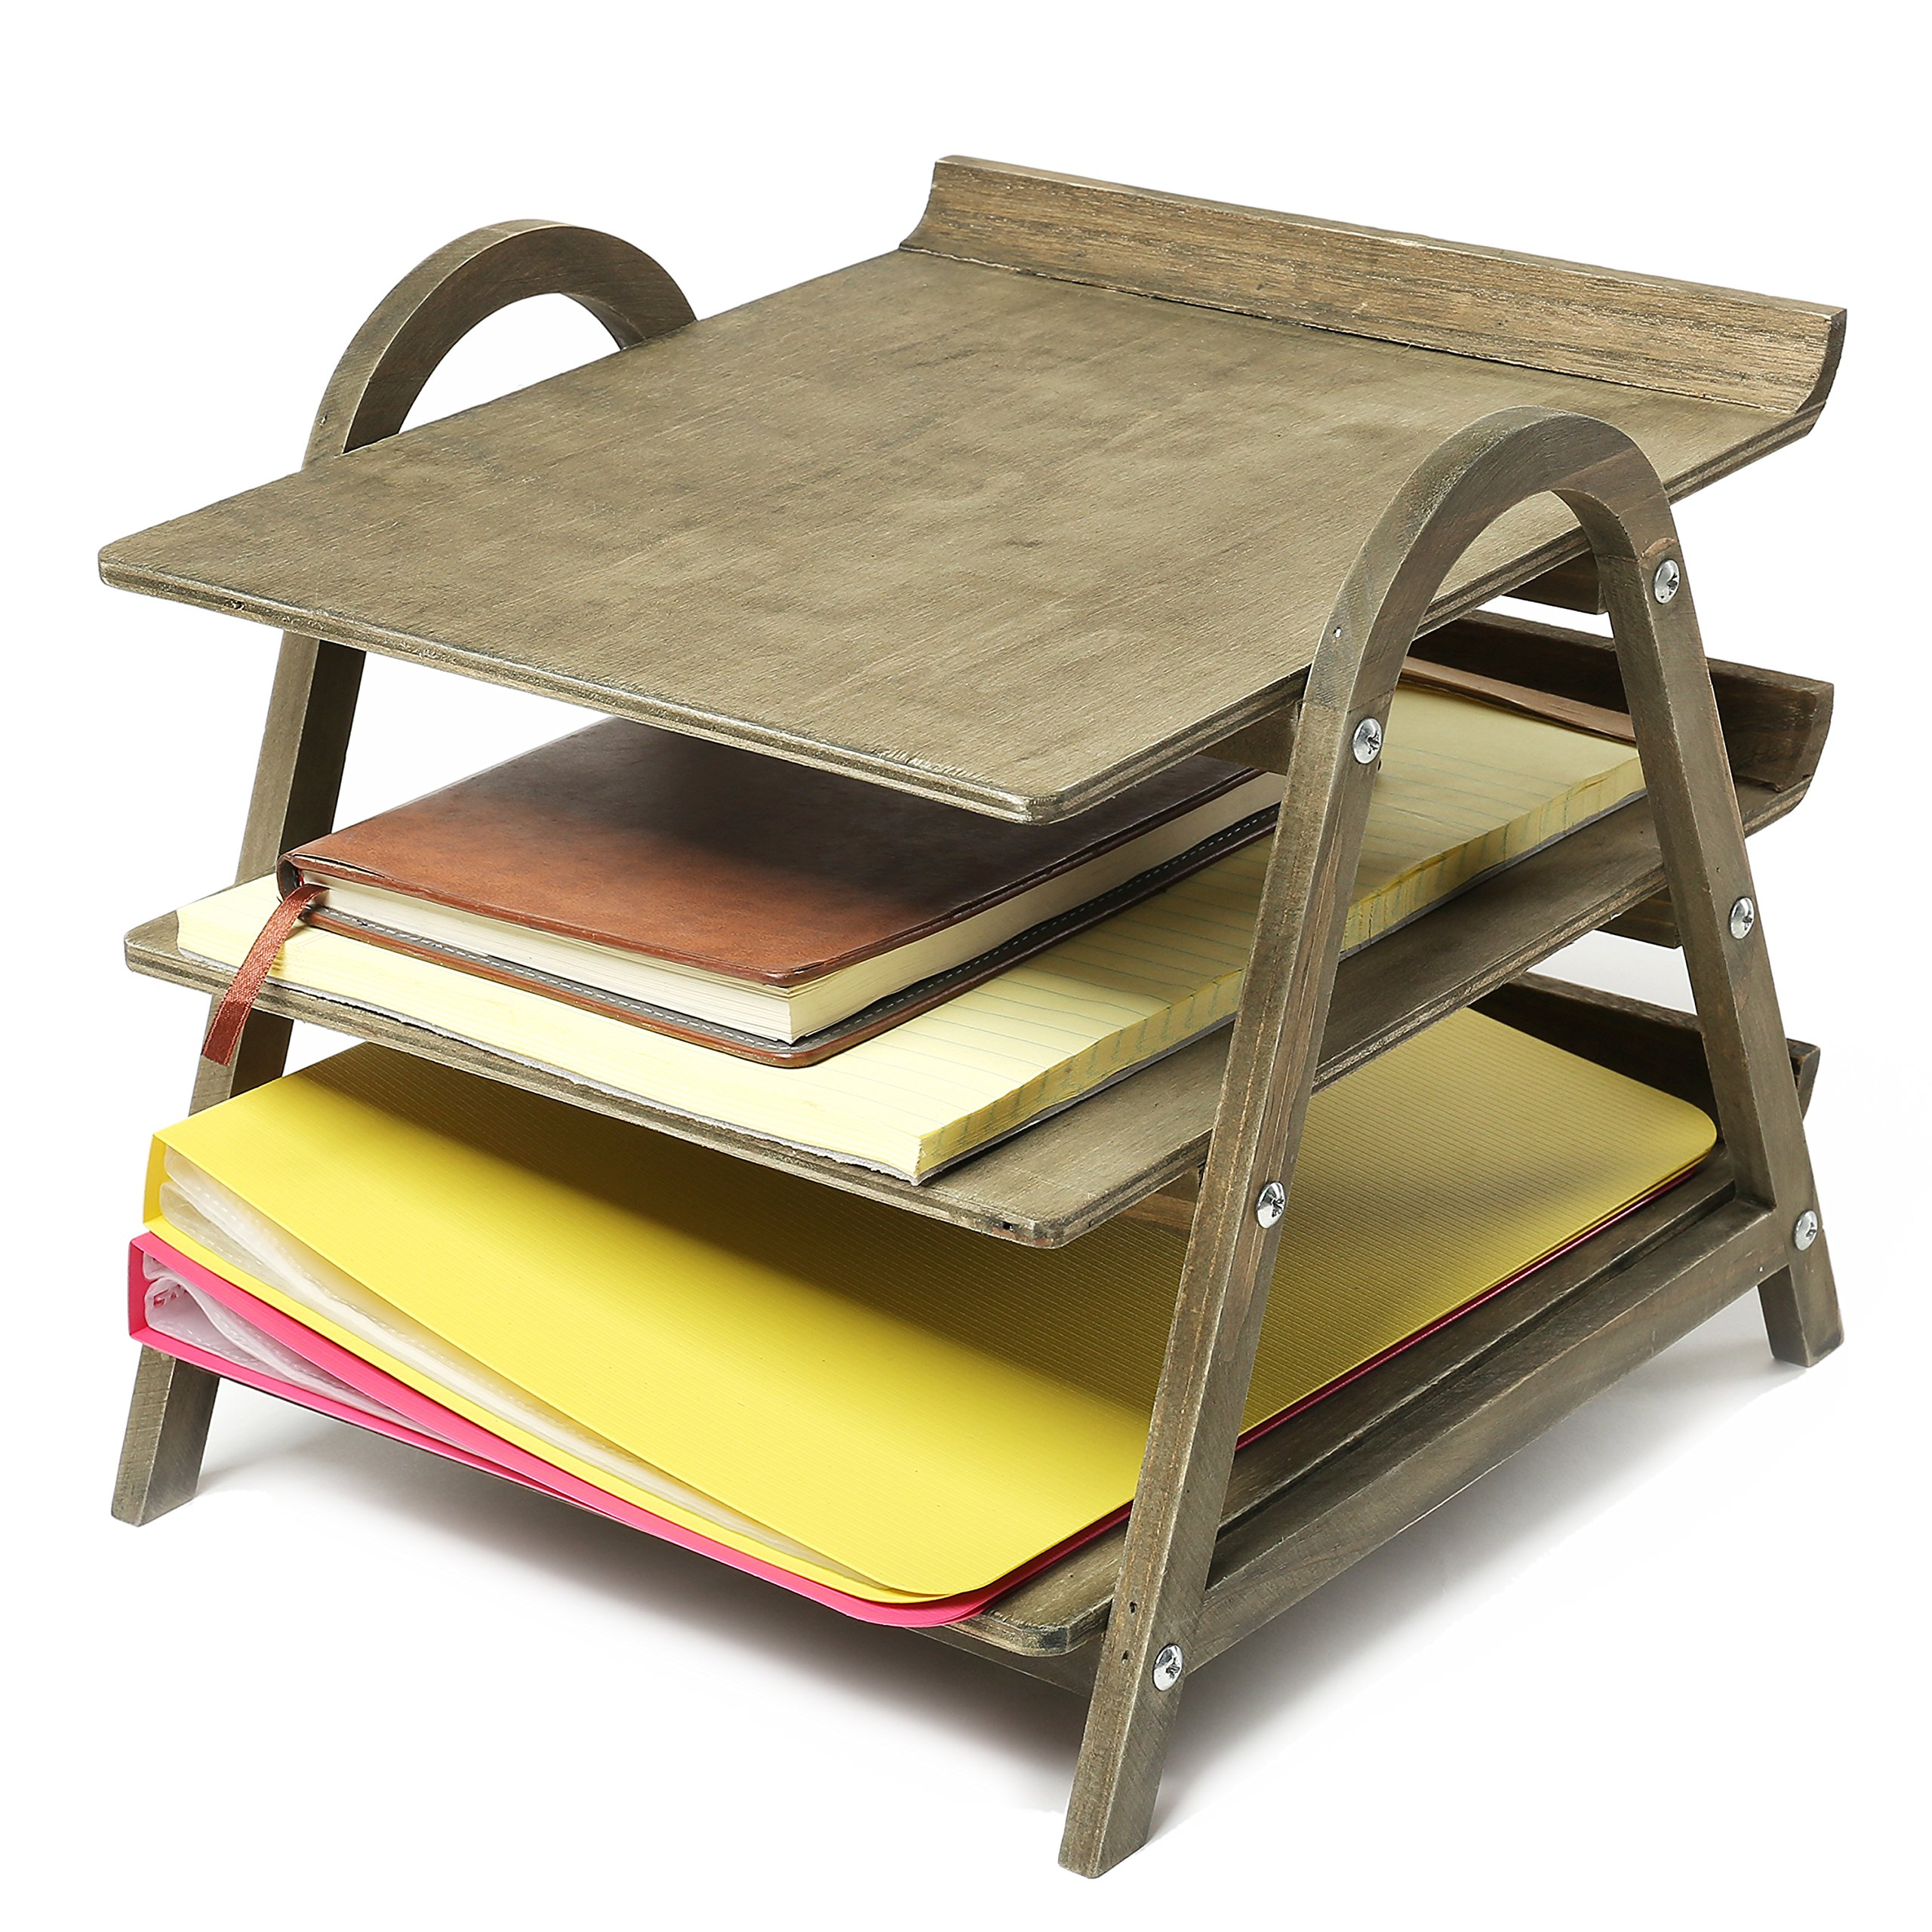 3 Tier Vintage Gray Wood Desktop Office Document Tray Holder, File Folder Rack by MyGift (Image #2)